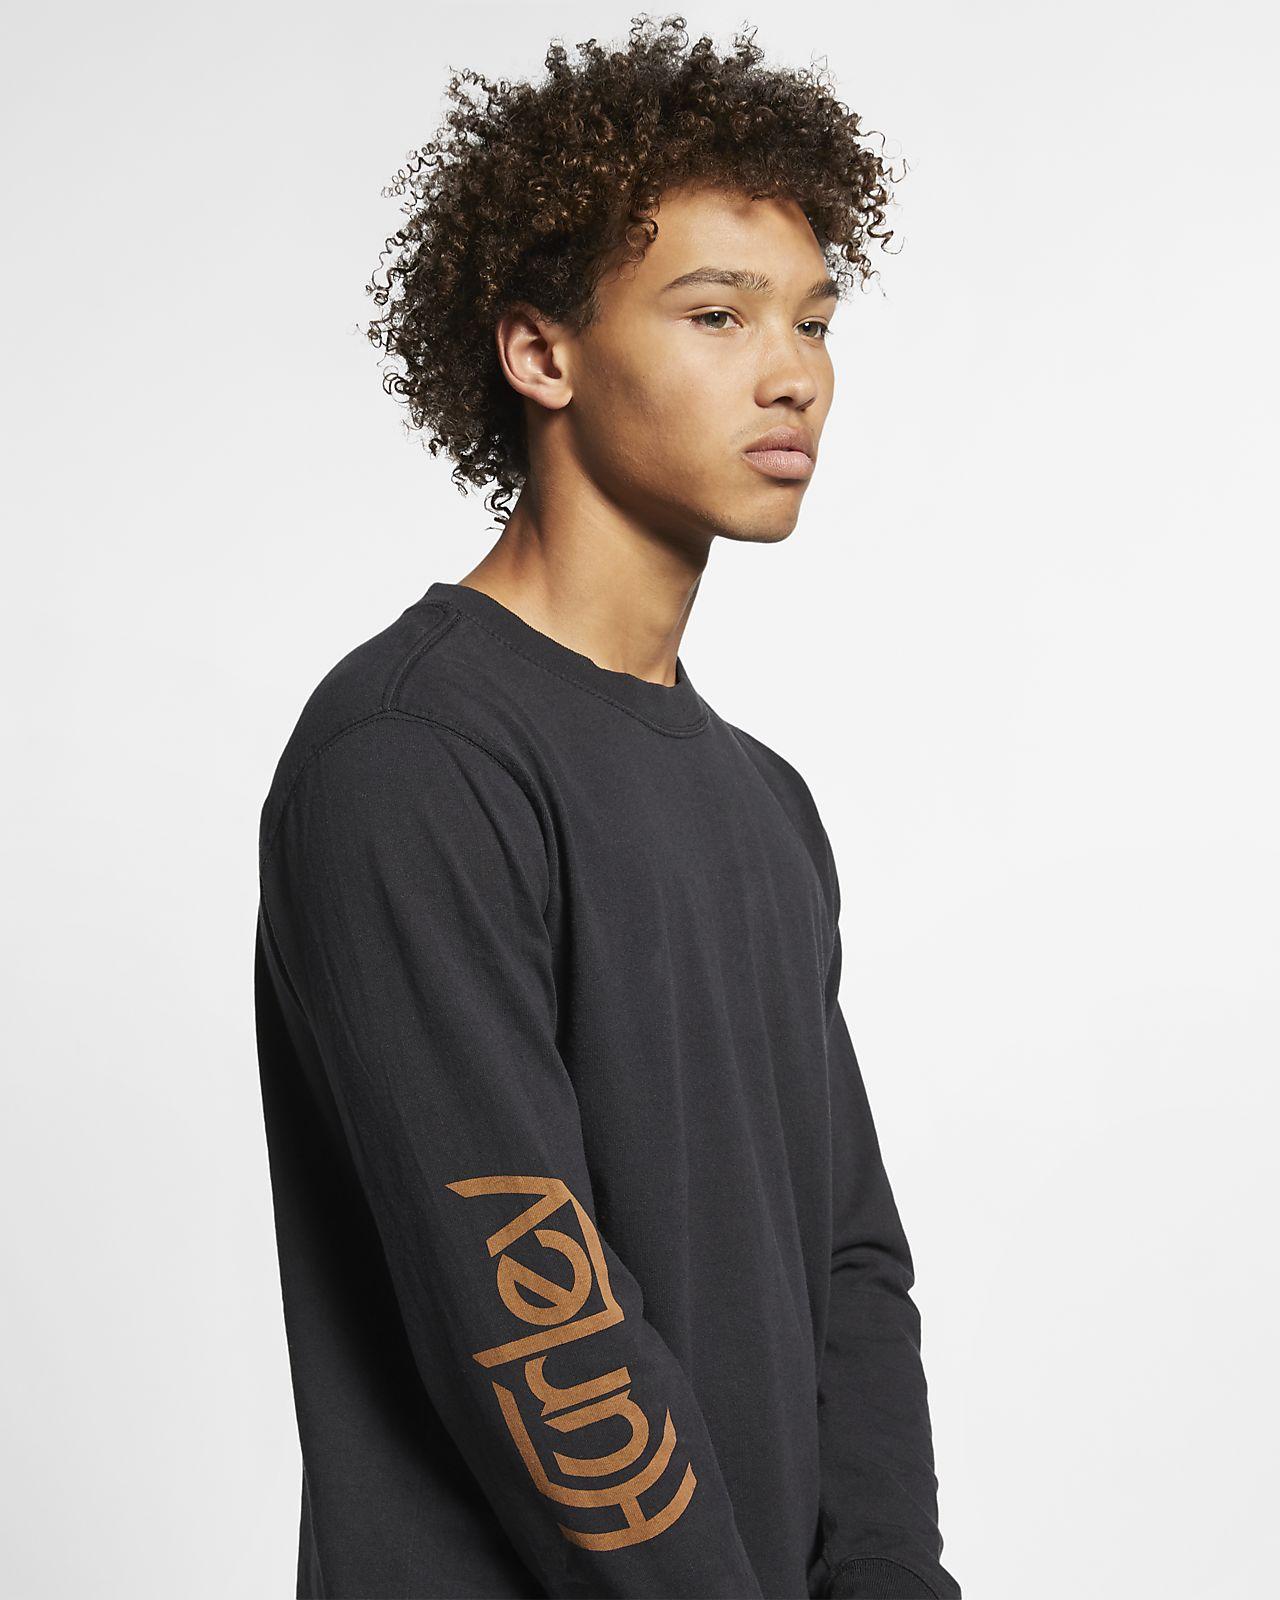 Hurley x Carhartt Long Sleeve T-Shirt